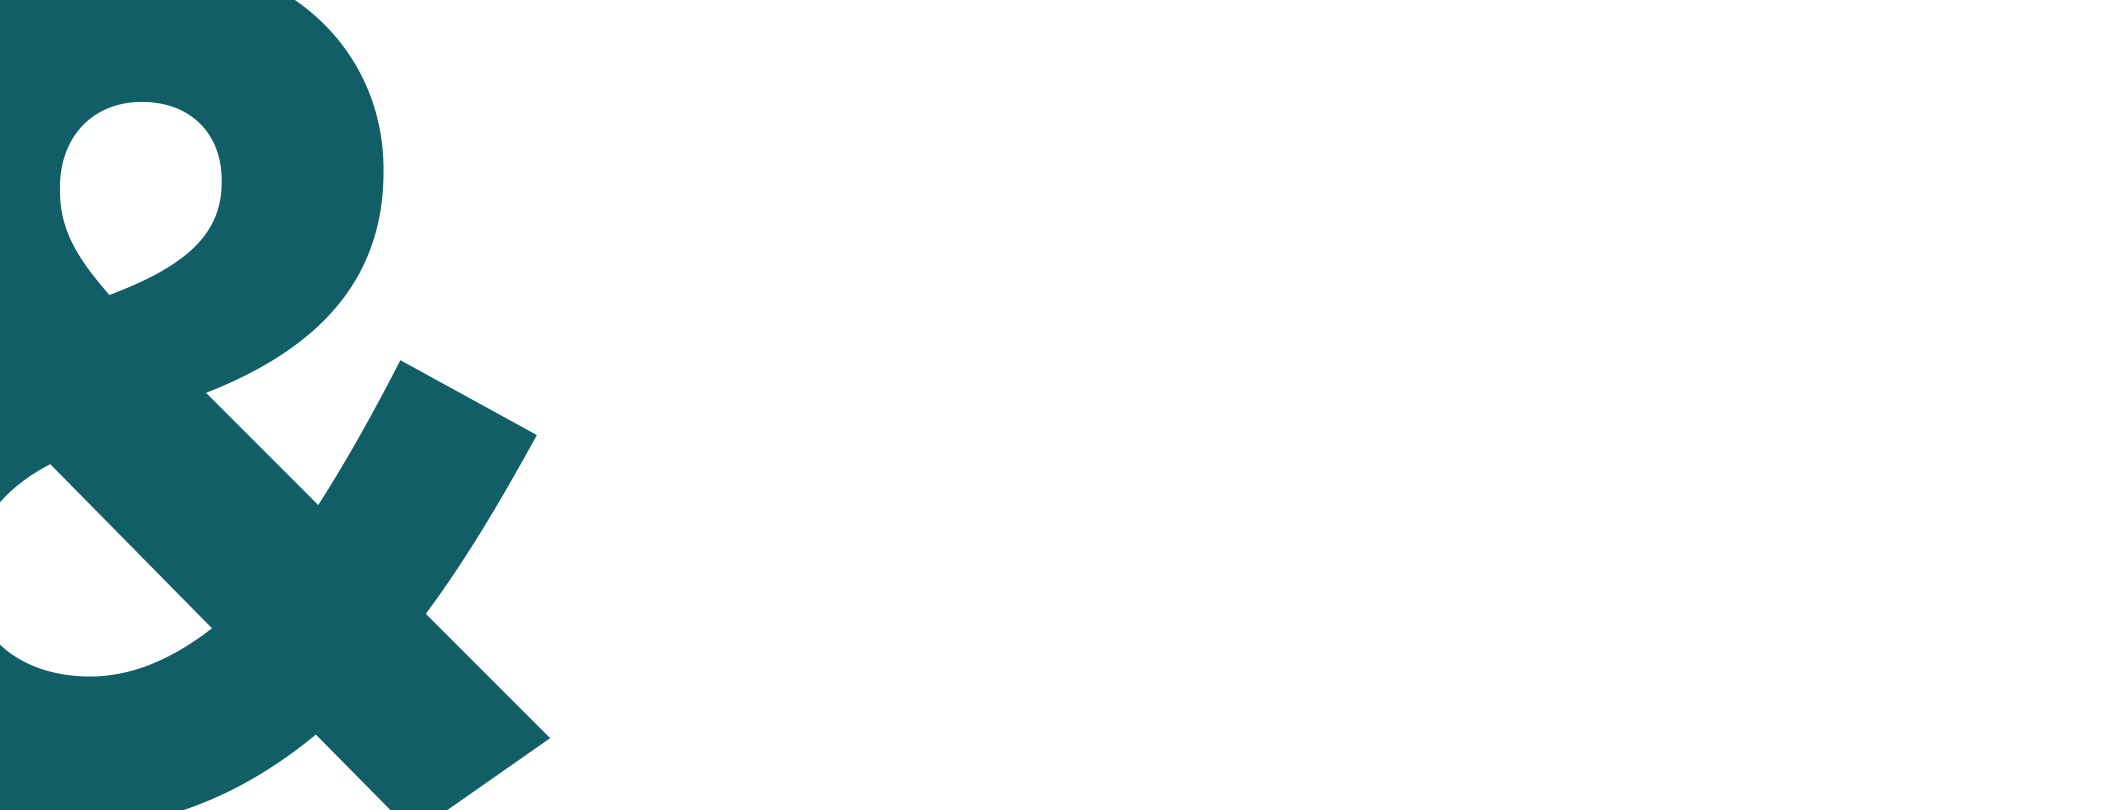 Together by design.